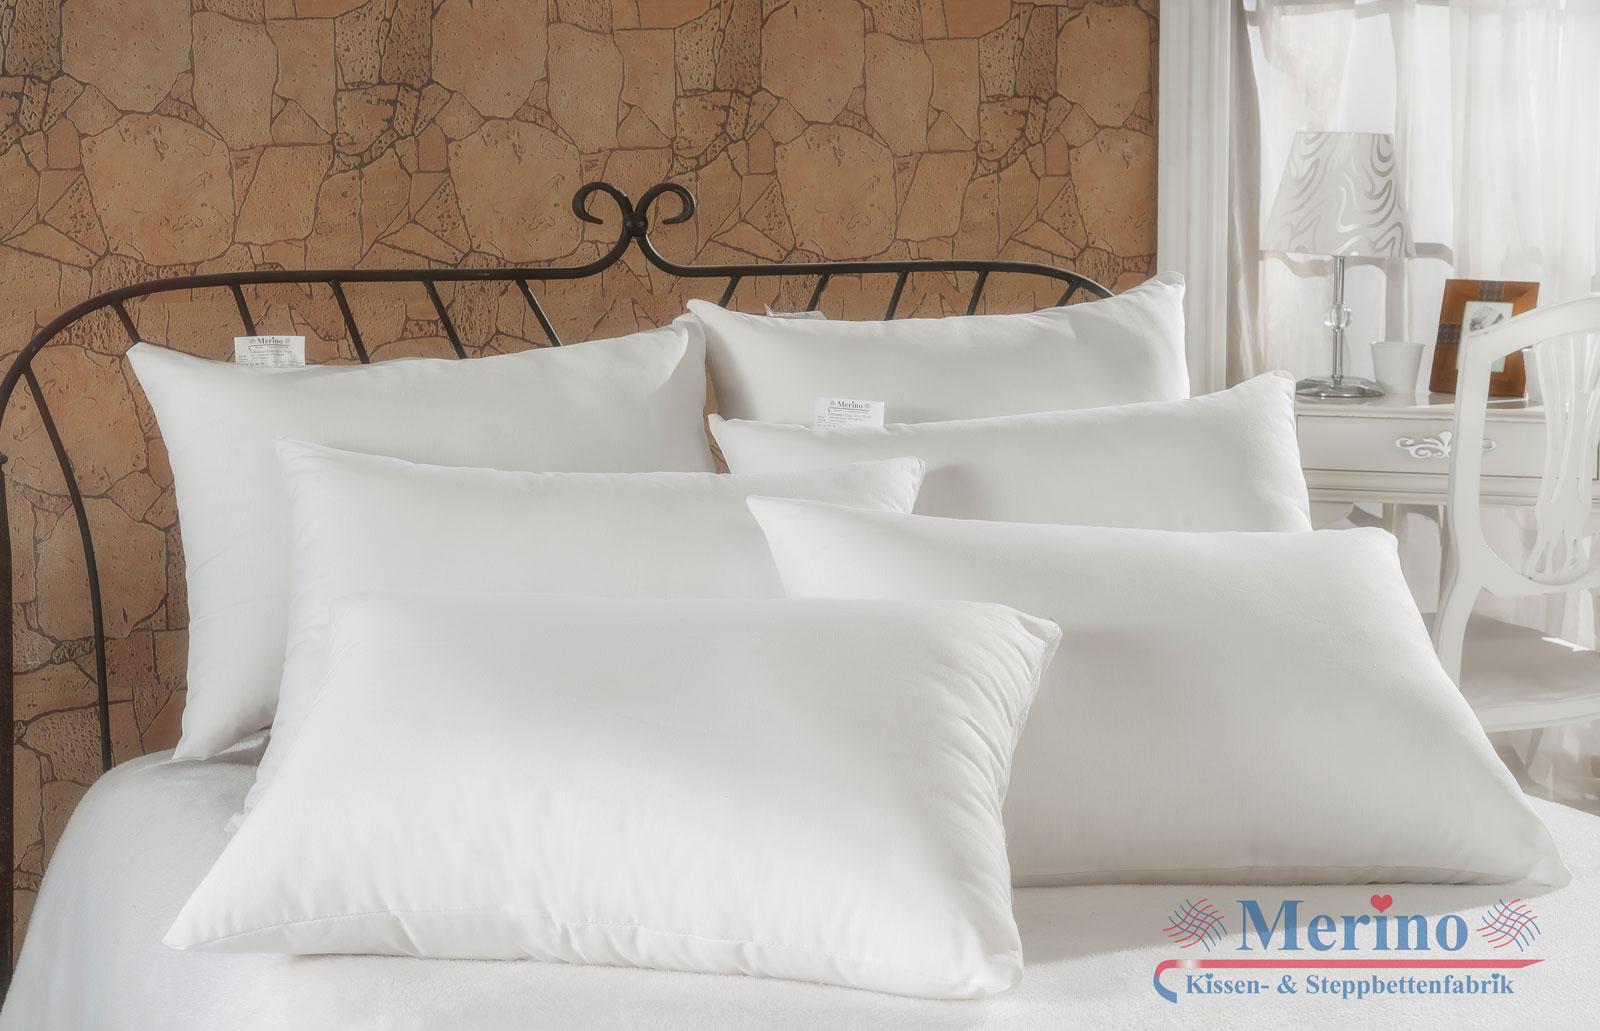 6er set kissenf llung kissen f llkissen inlett dekokissen 50 x 70 cm modell easy ebay. Black Bedroom Furniture Sets. Home Design Ideas